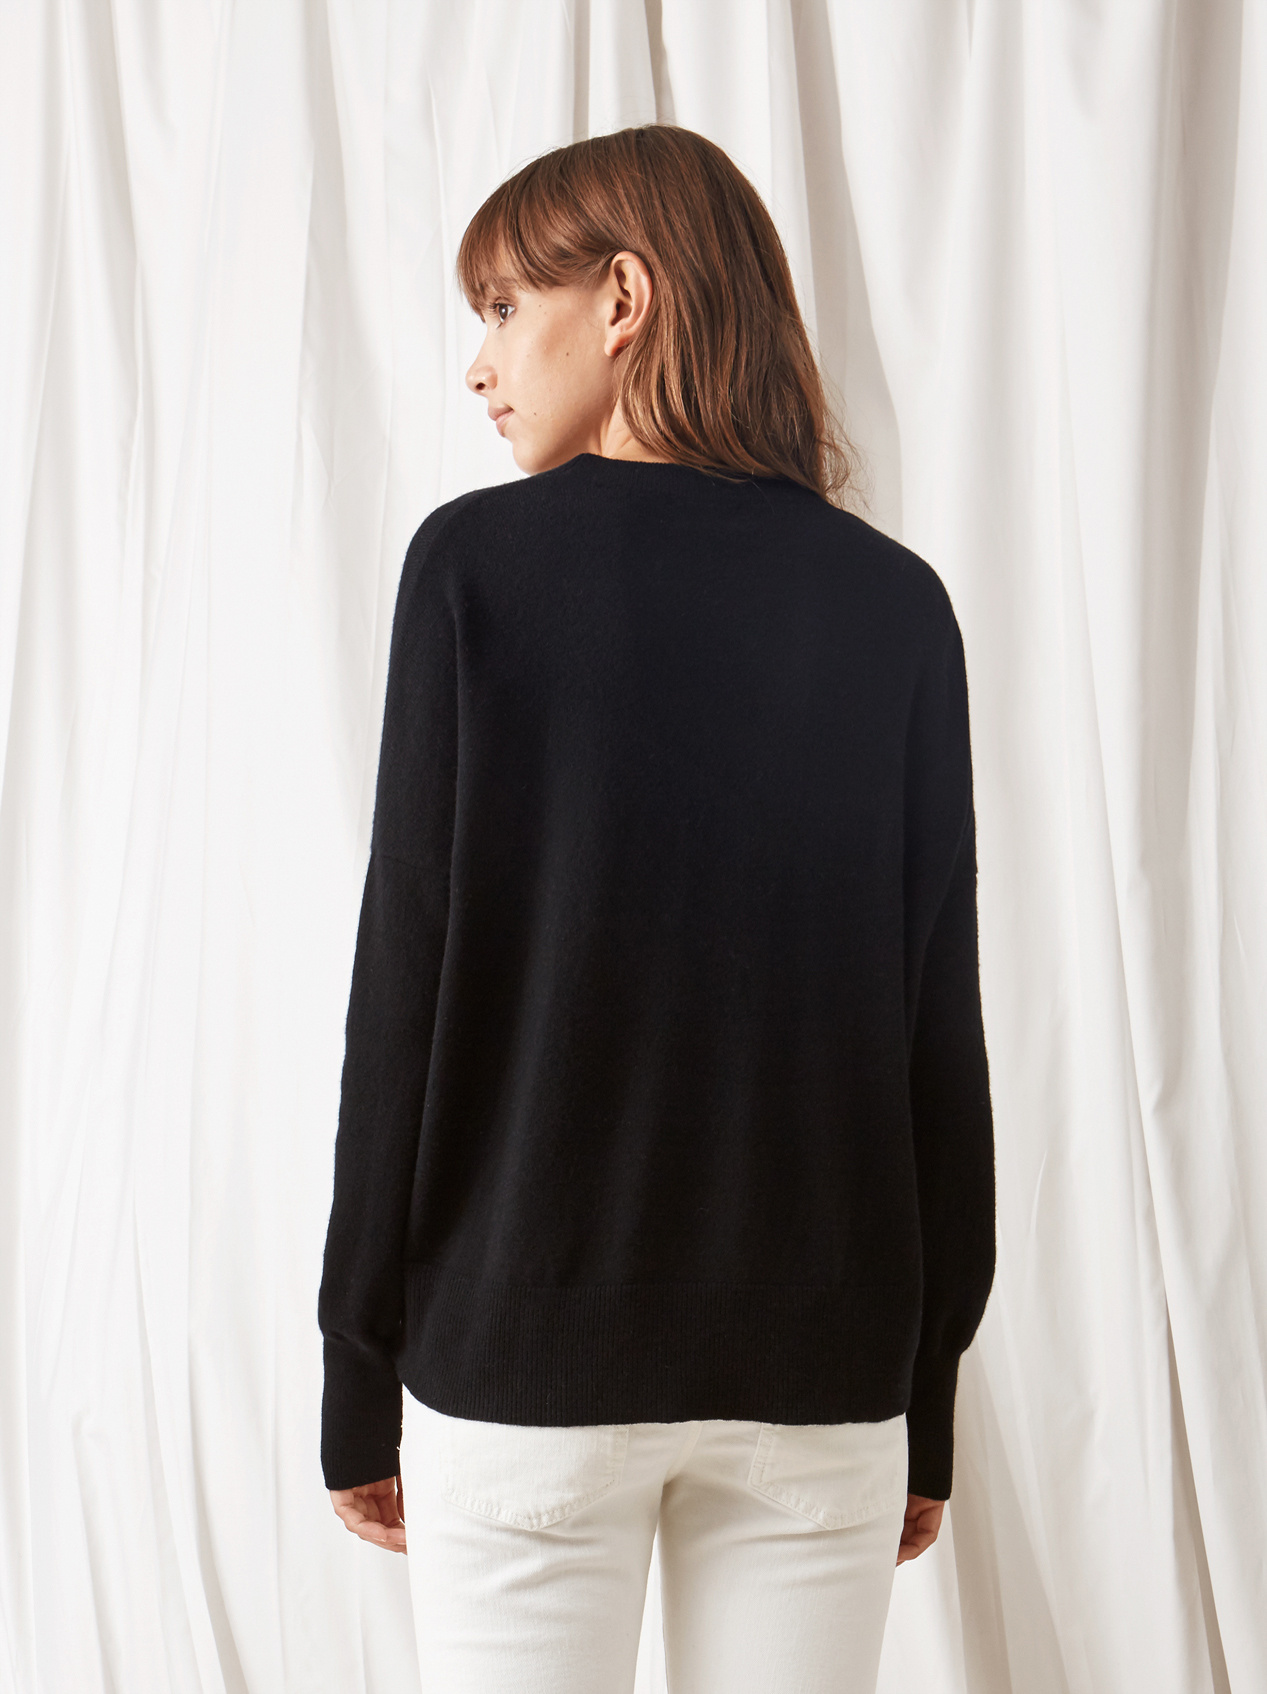 Soft Goat Boyfriend Sweater Black